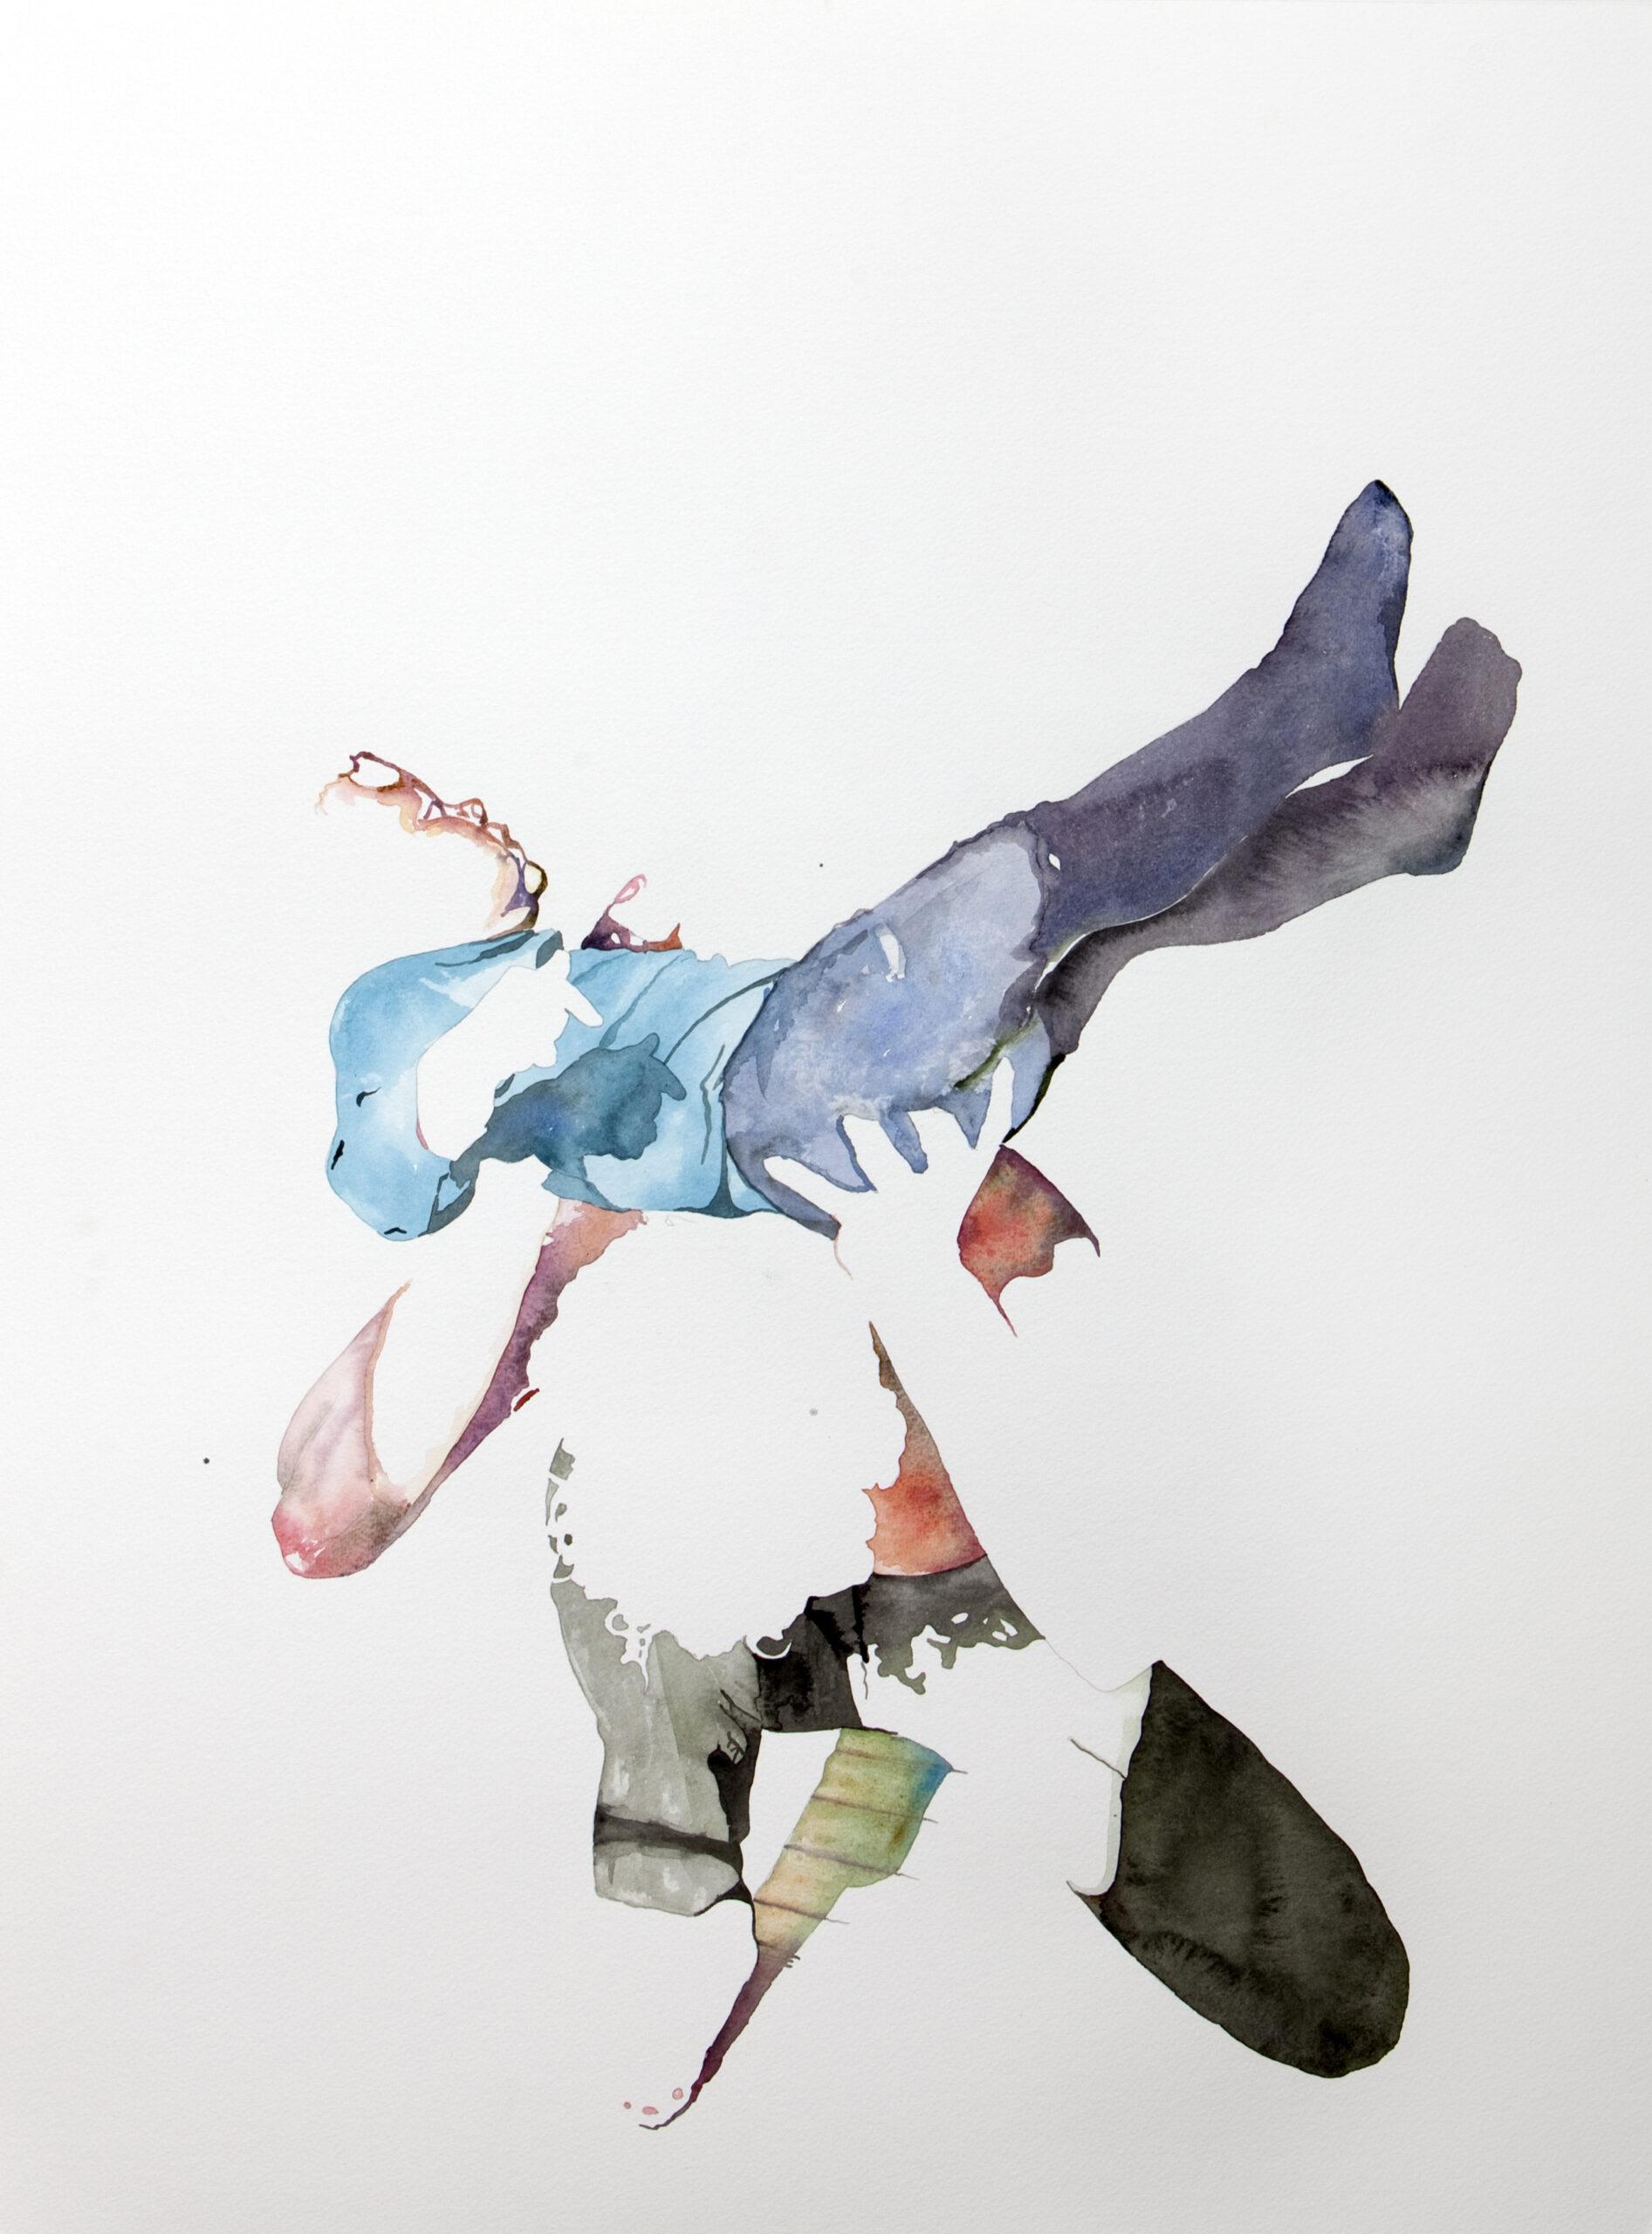 Wouter van de Koot drawing watercolour man holding boy over his head